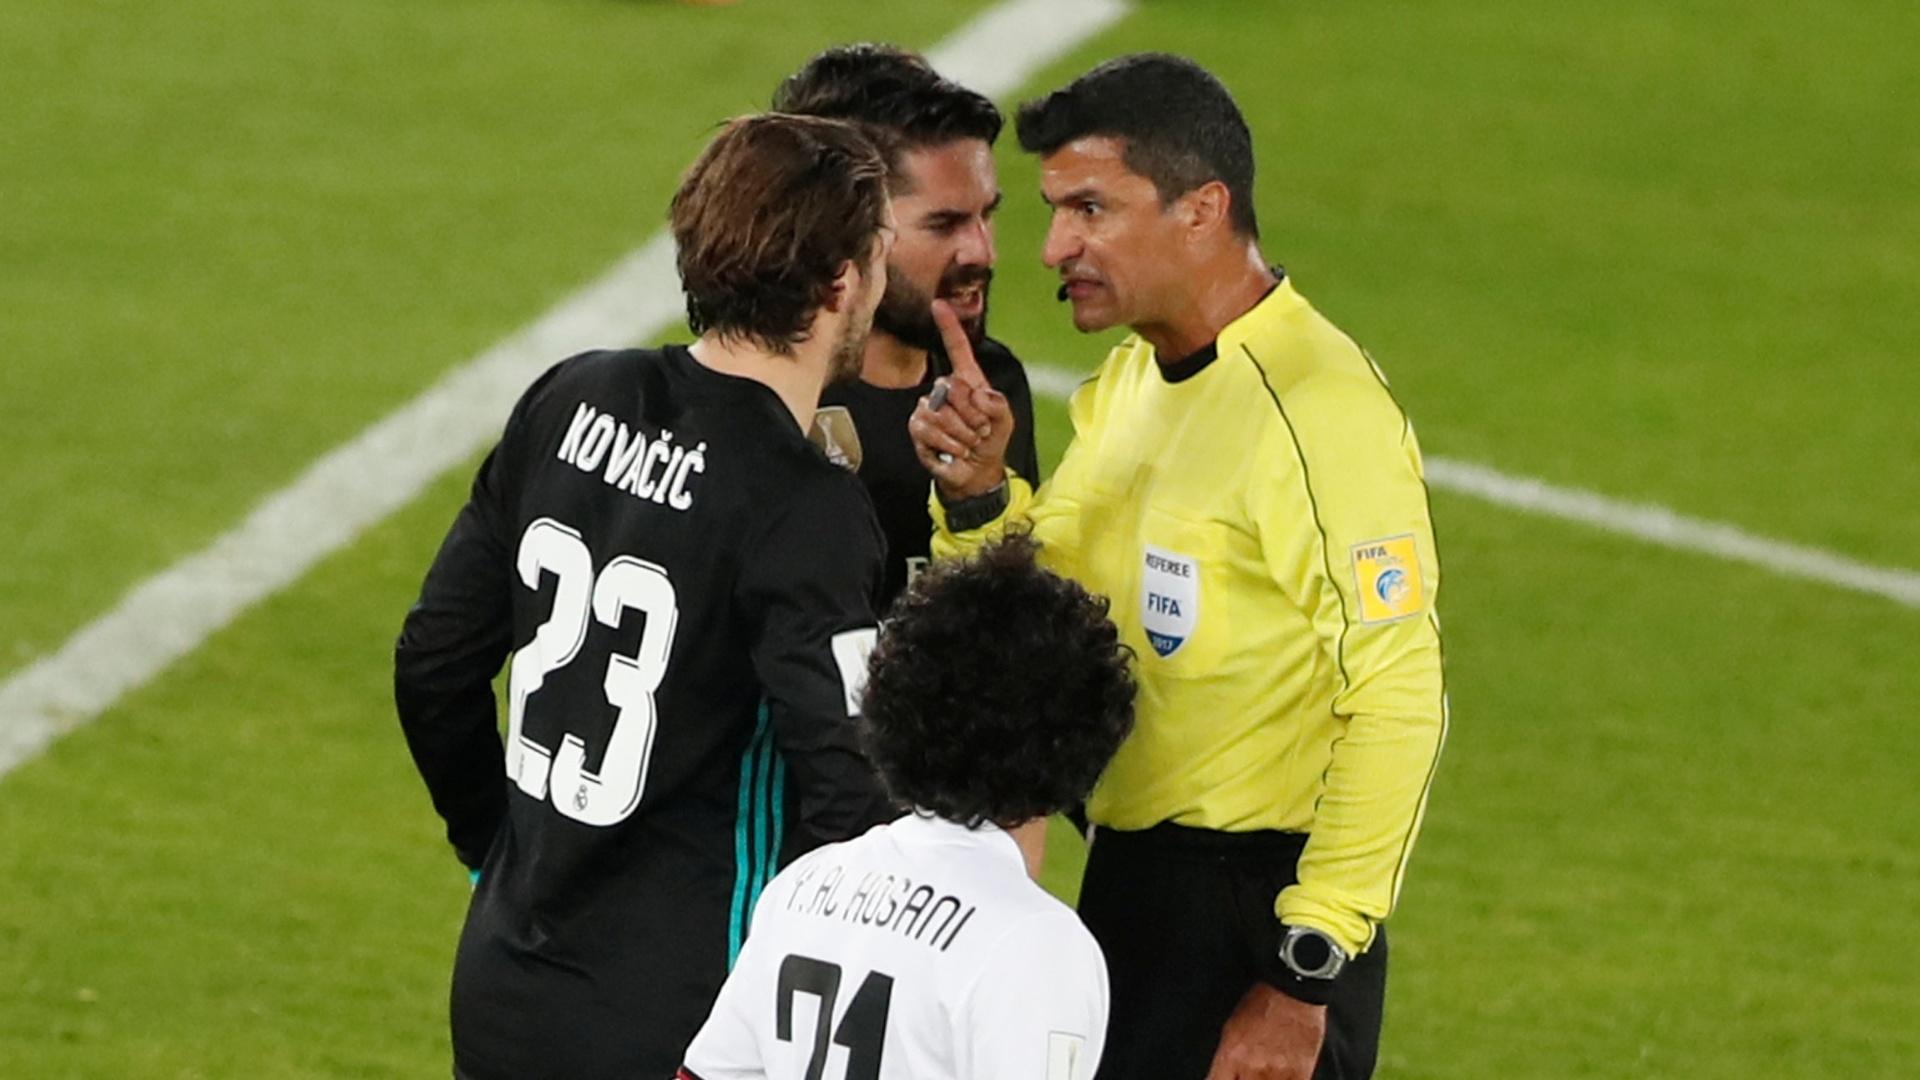 Sandro Meira Ricci anula gol do Real Madrid após auxílio do árbitro de vídeo